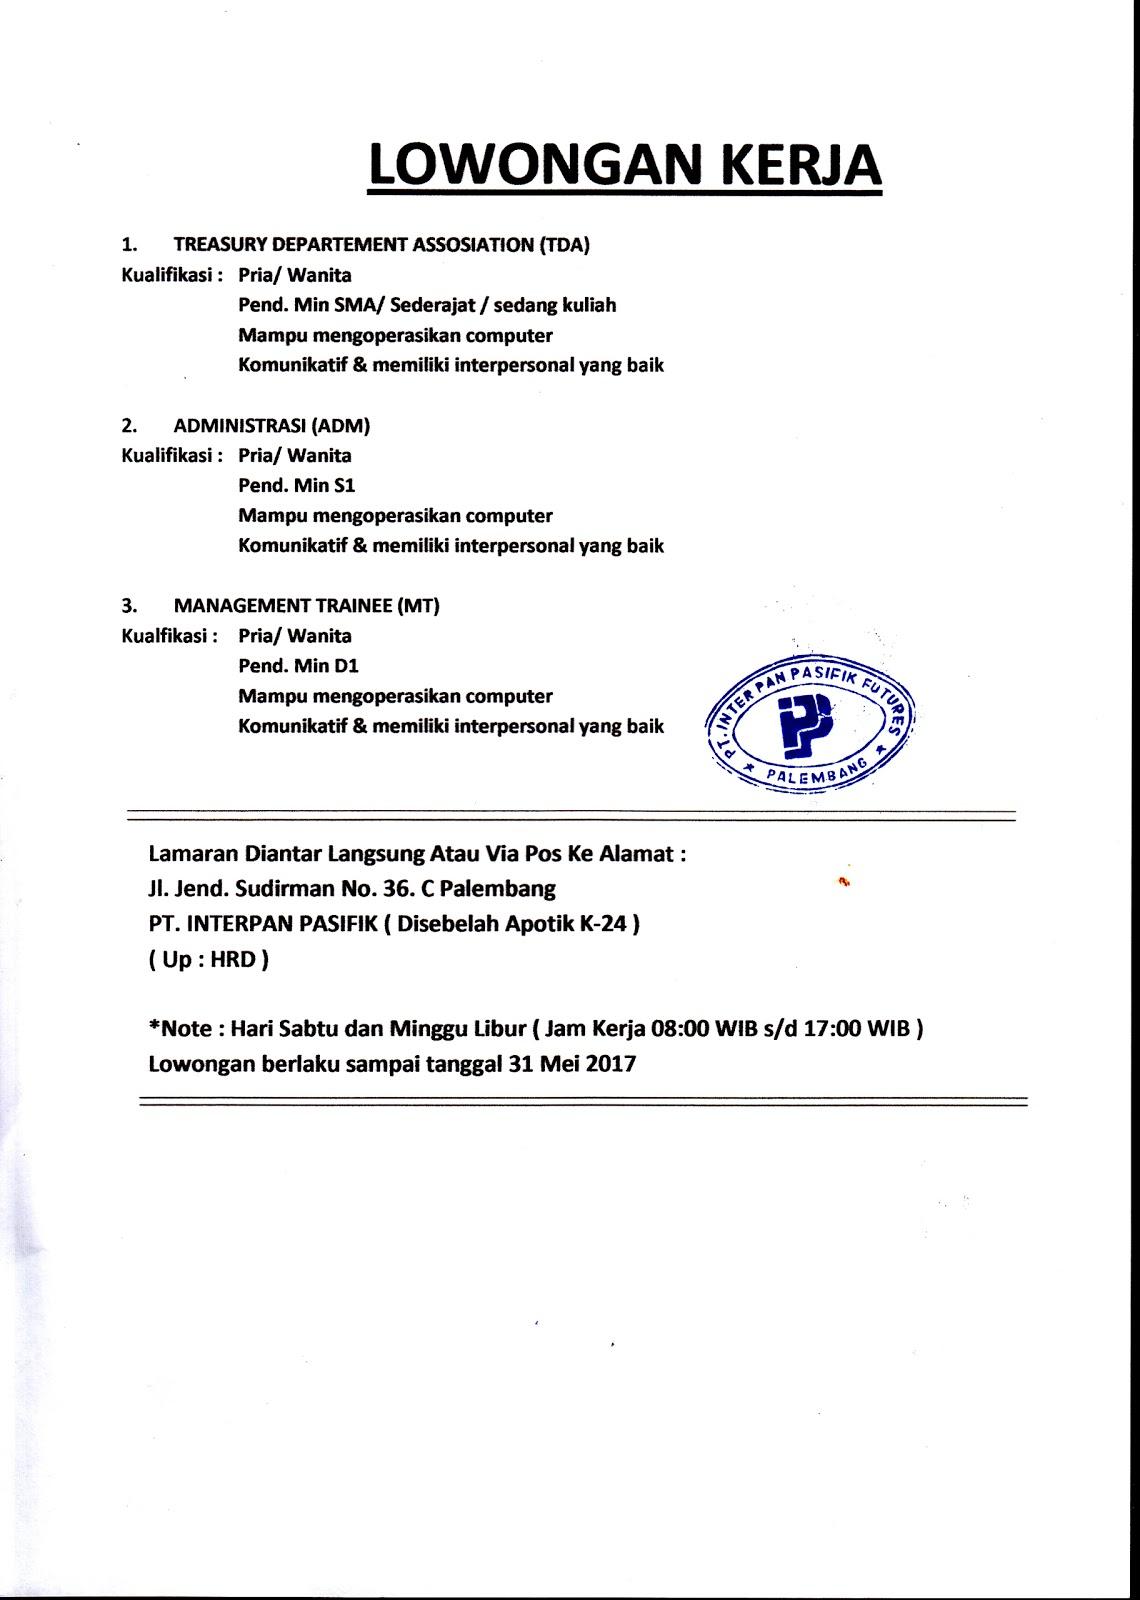 3 Lowongan Kerja Minimal Pendidikan SMA Palembang